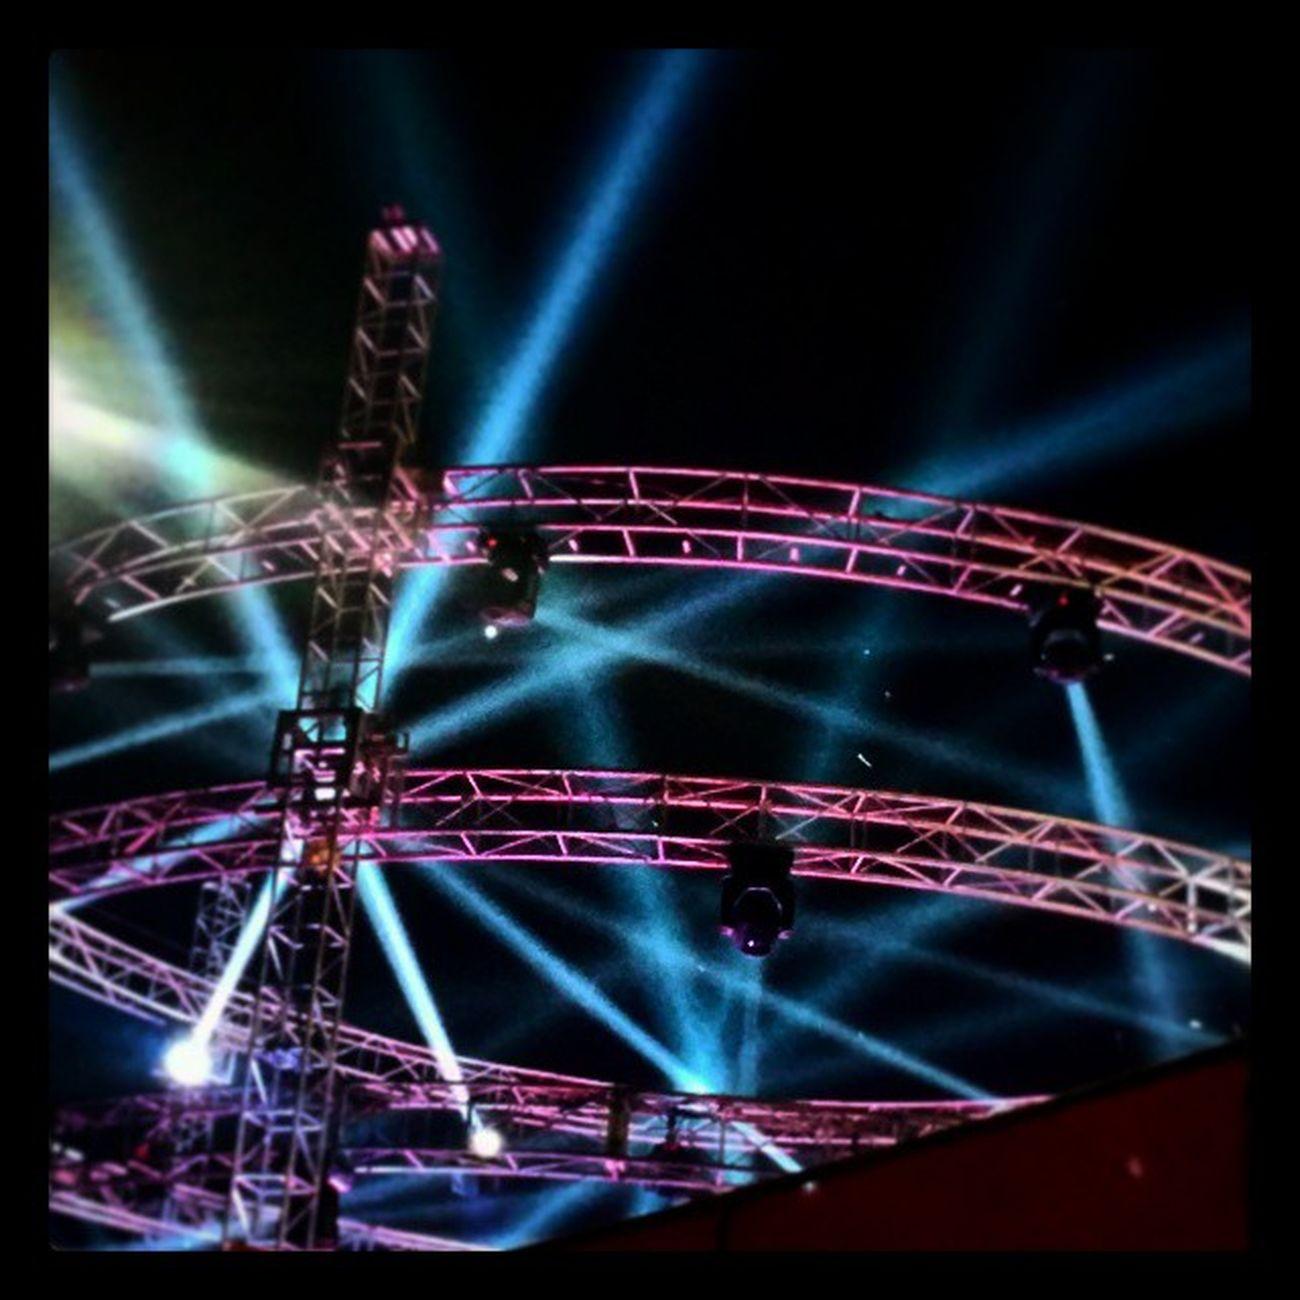 Gagans_photography Random Musical Event Lights Diwali2014